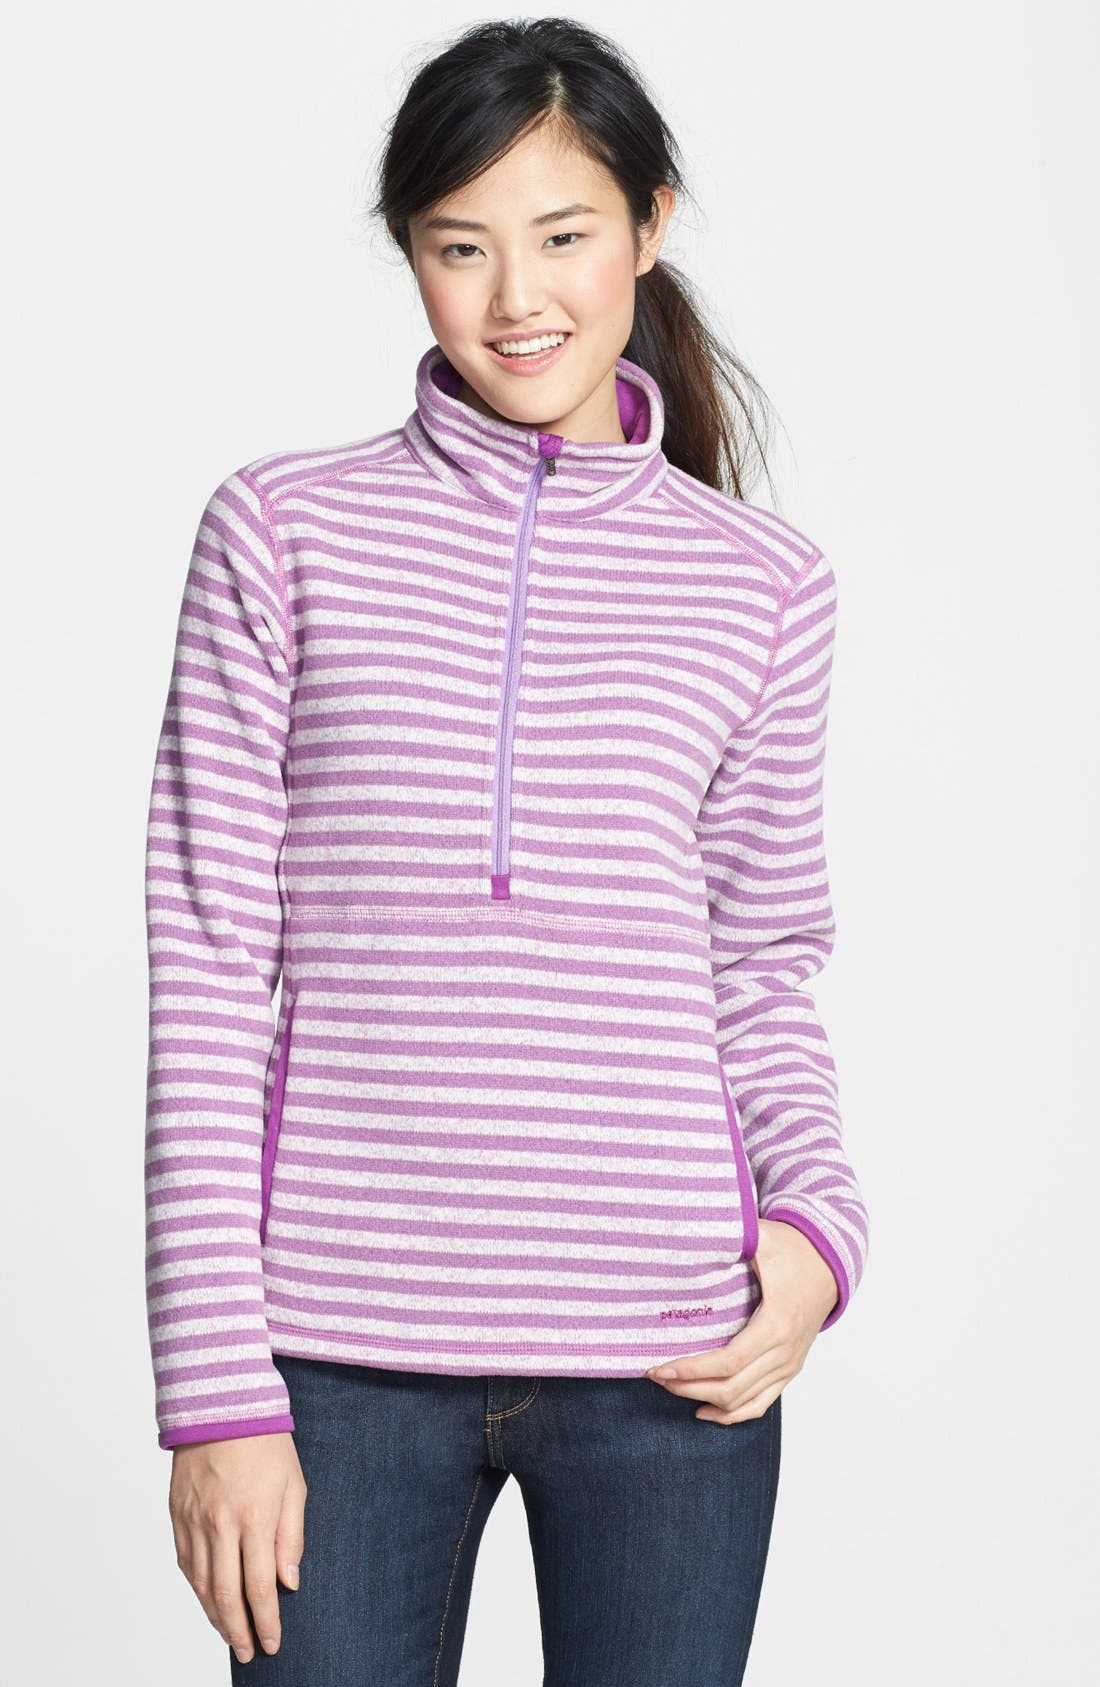 Alternate Image 1 Selected - Patagonia 'Better Sweater' Half Zip Pullover